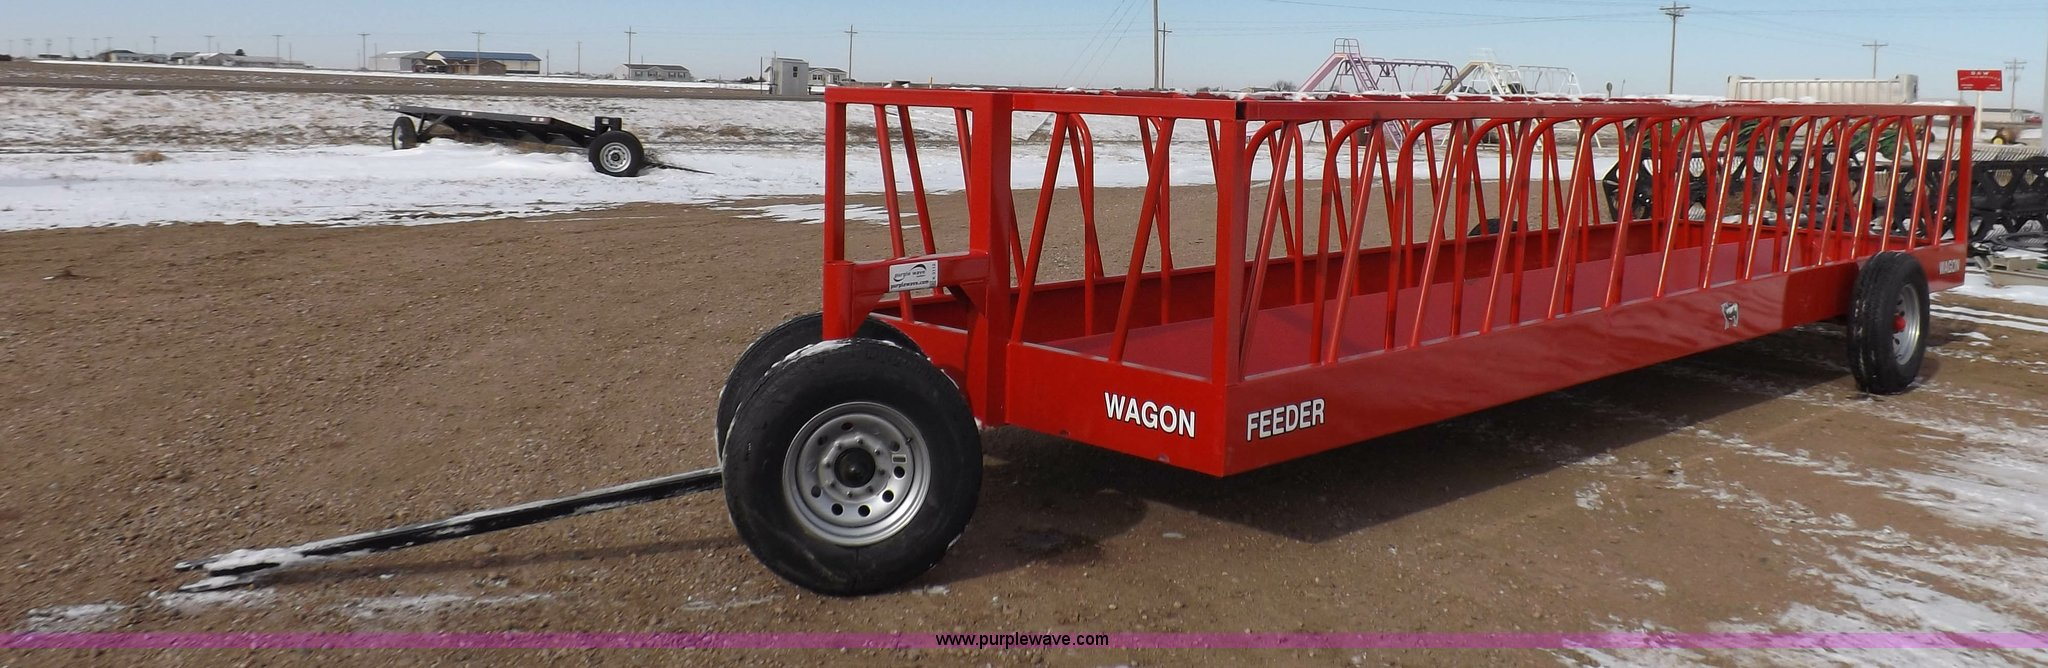 feeder hay wagon product sale